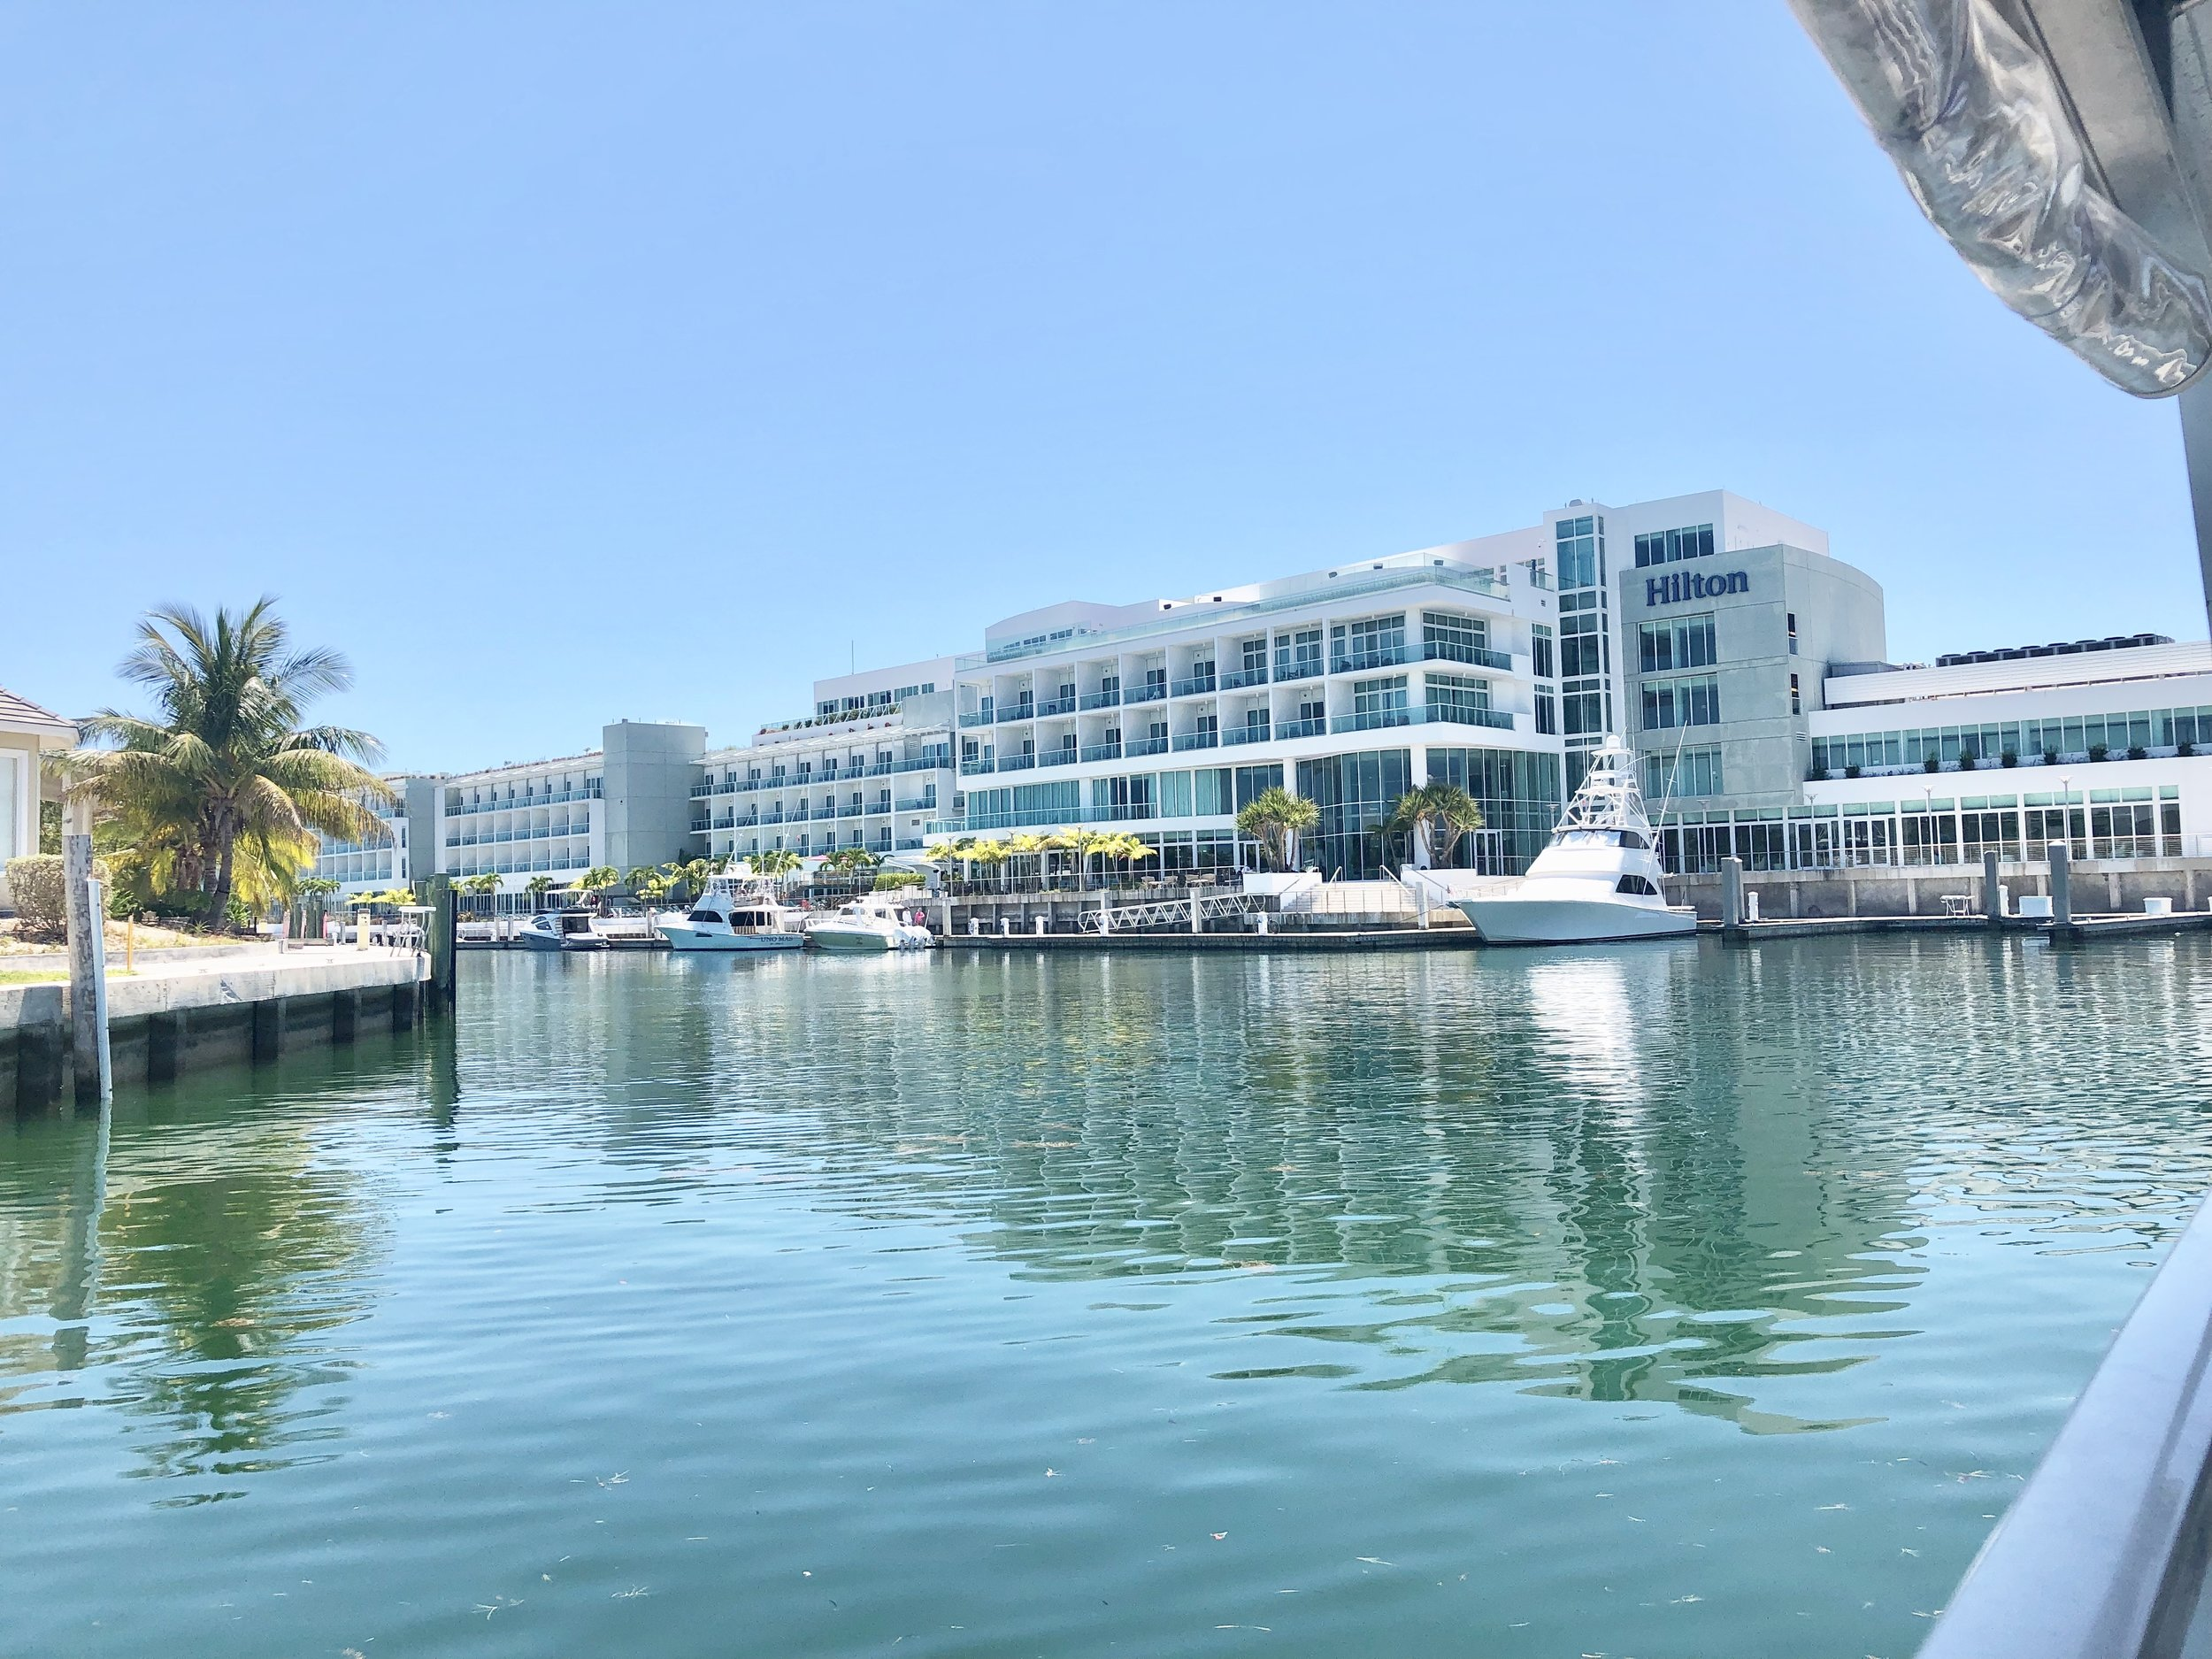 Hilton Resorts World Bimini, Bahamas